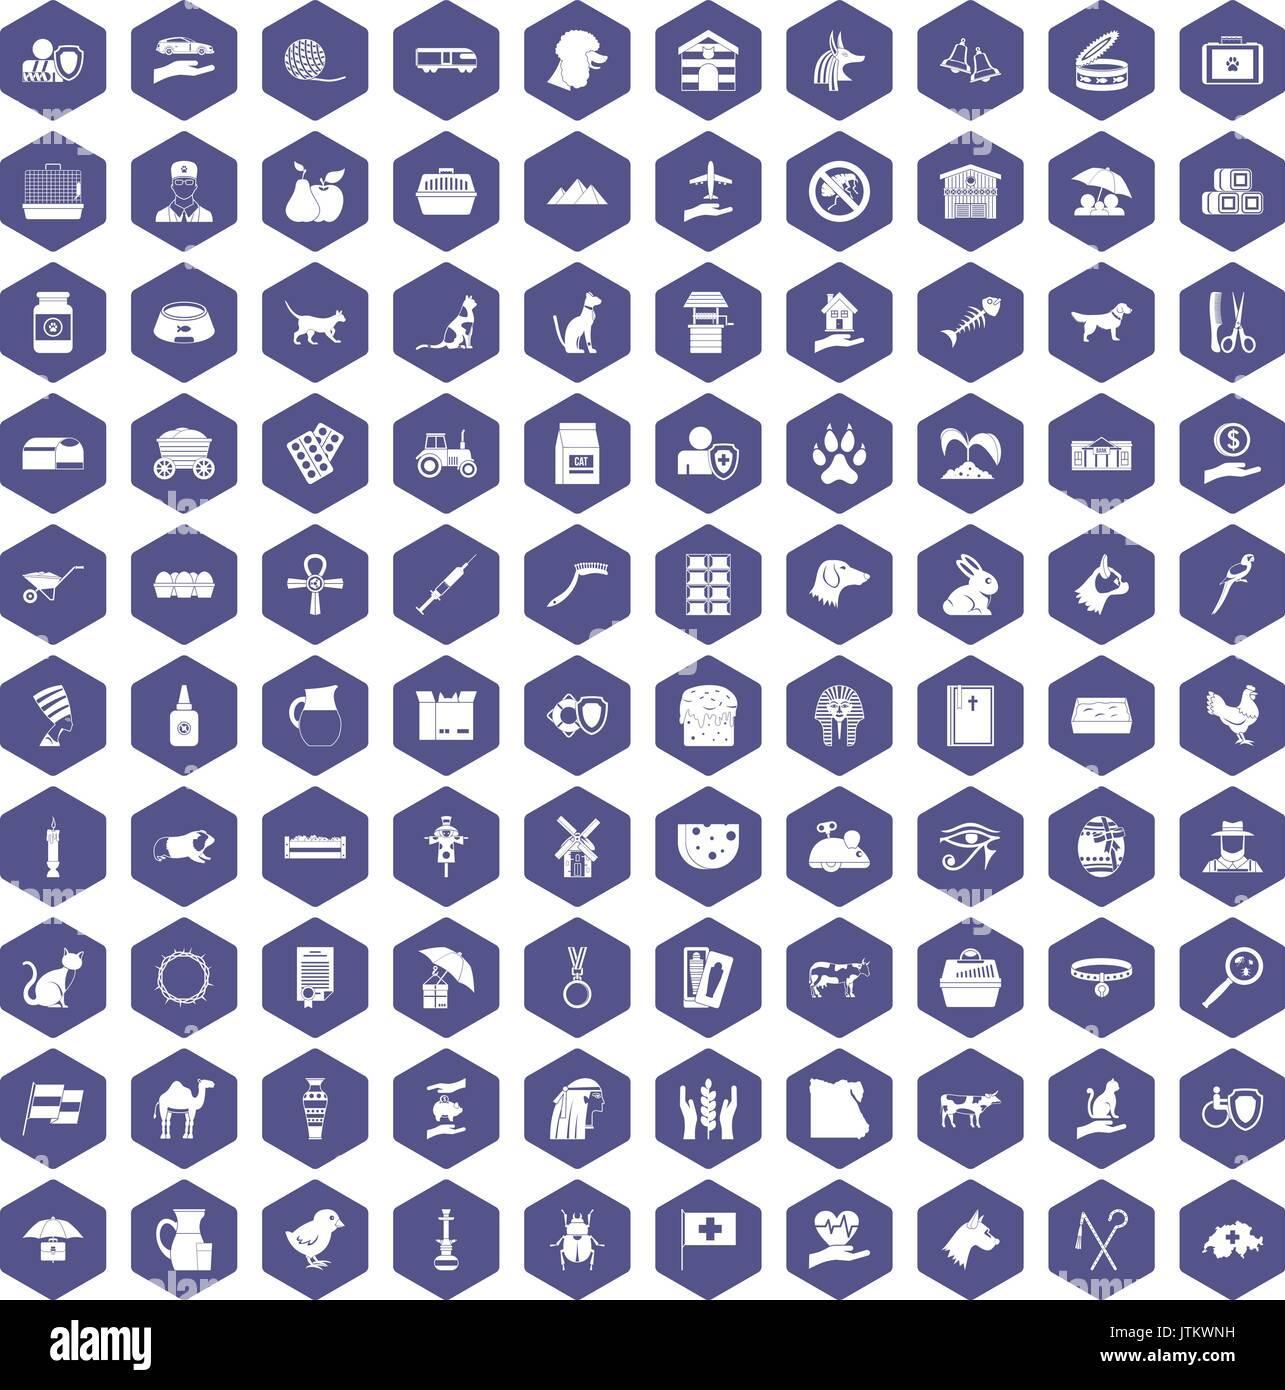 100 pets icons hexagon purple - Stock Image